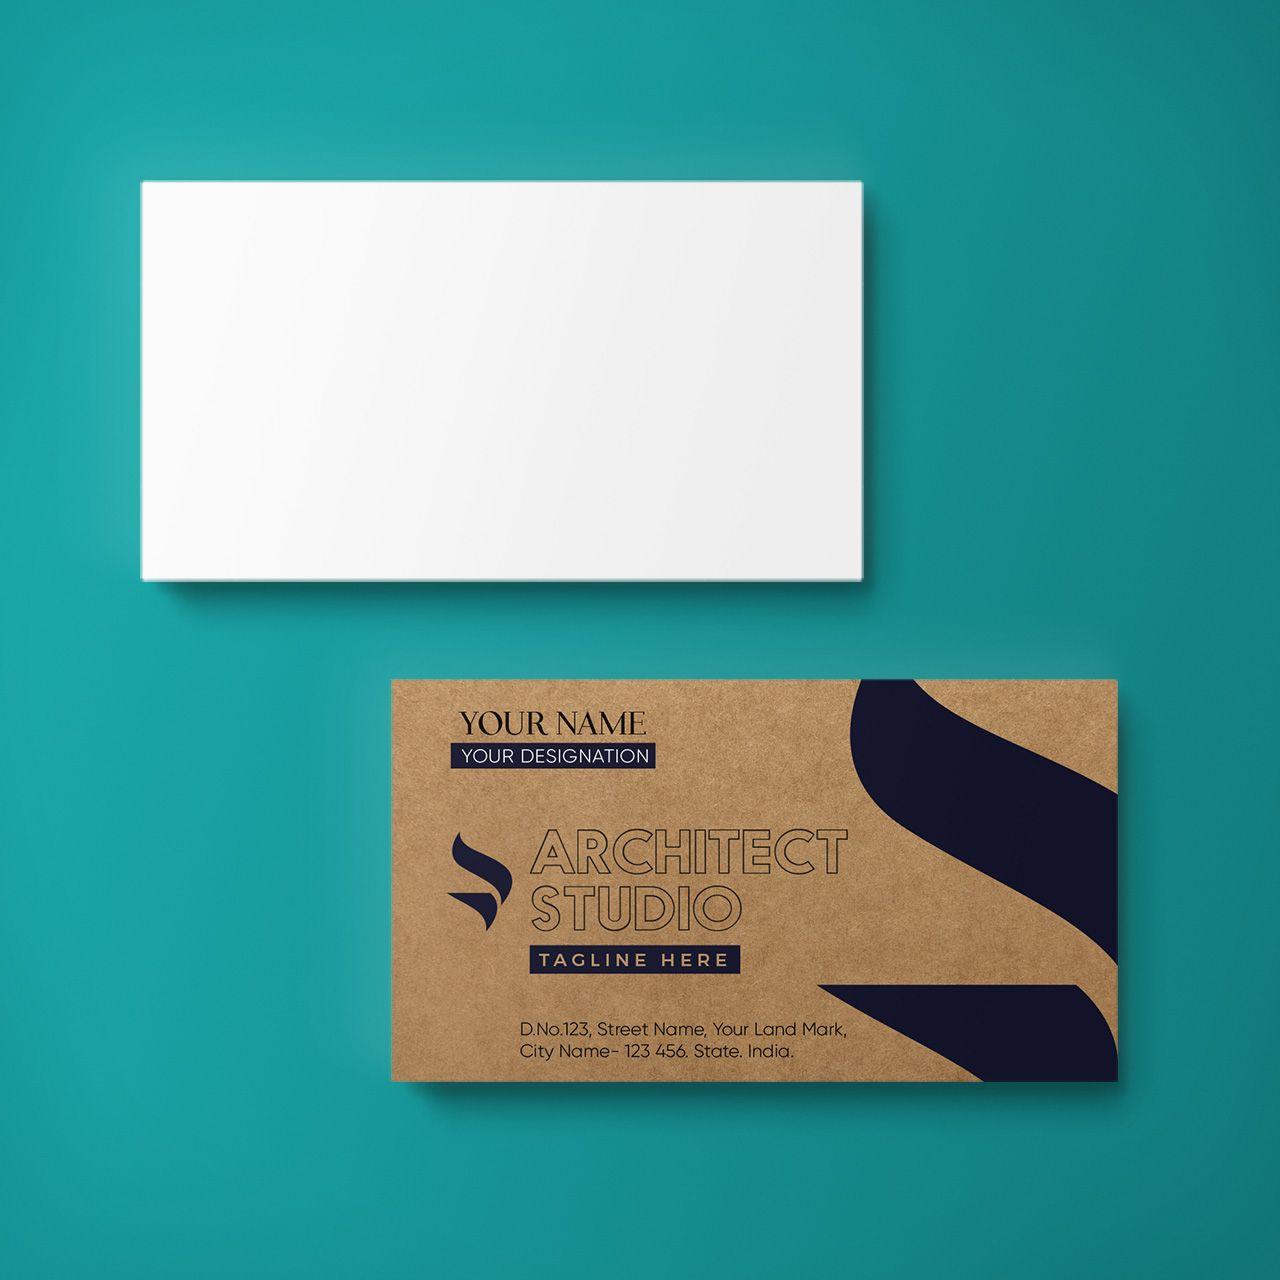 Kraft Business Cards Horizontal Single Sided Kraft Business Cards Cards Business Card Design